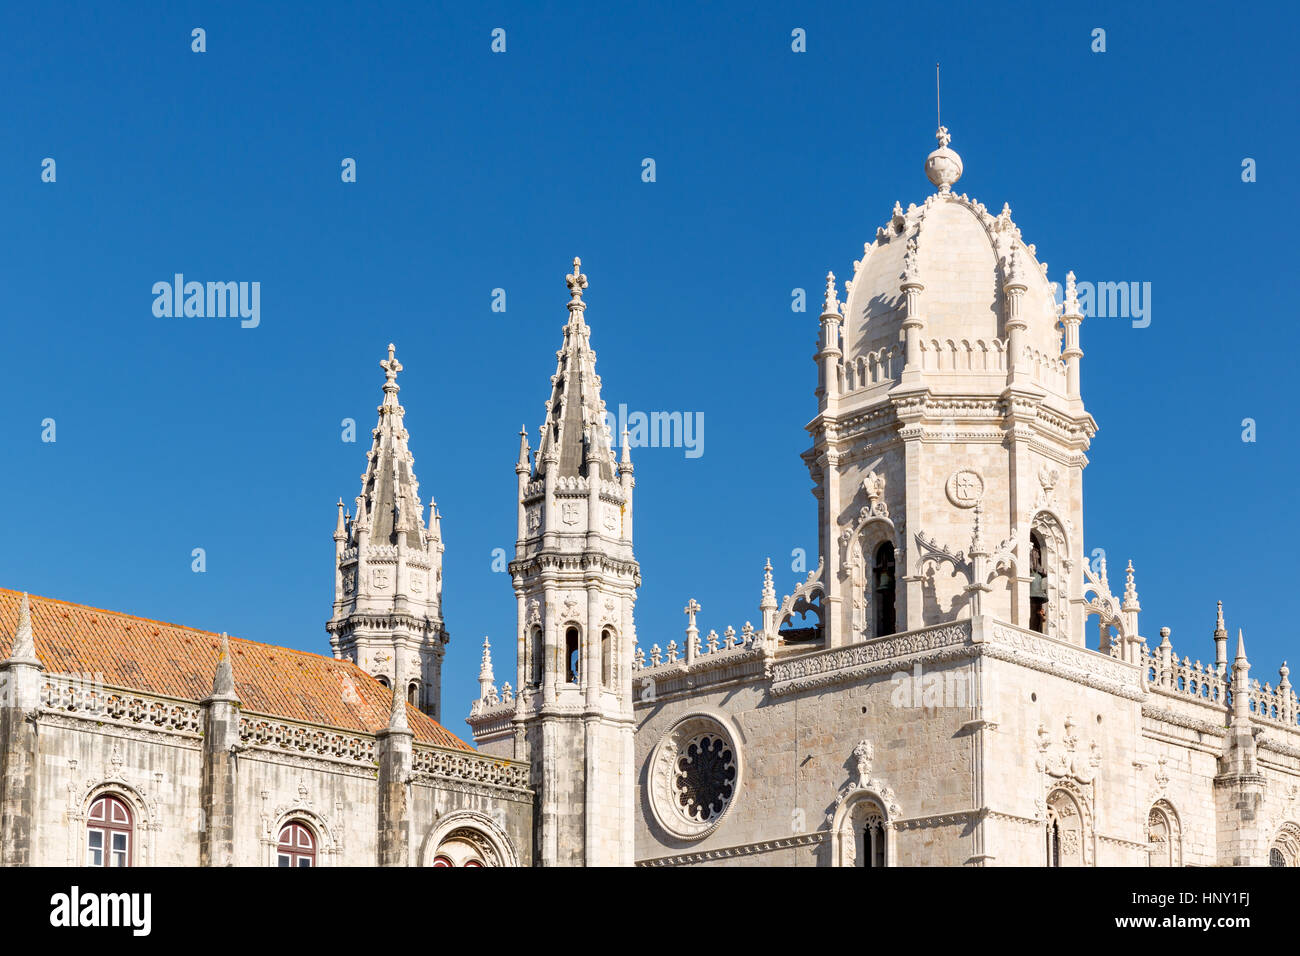 Mosteiro dos Jeronimos or the church of the Jerónimos Monastery, Belém, Lisbon, Portugal - Stock Image